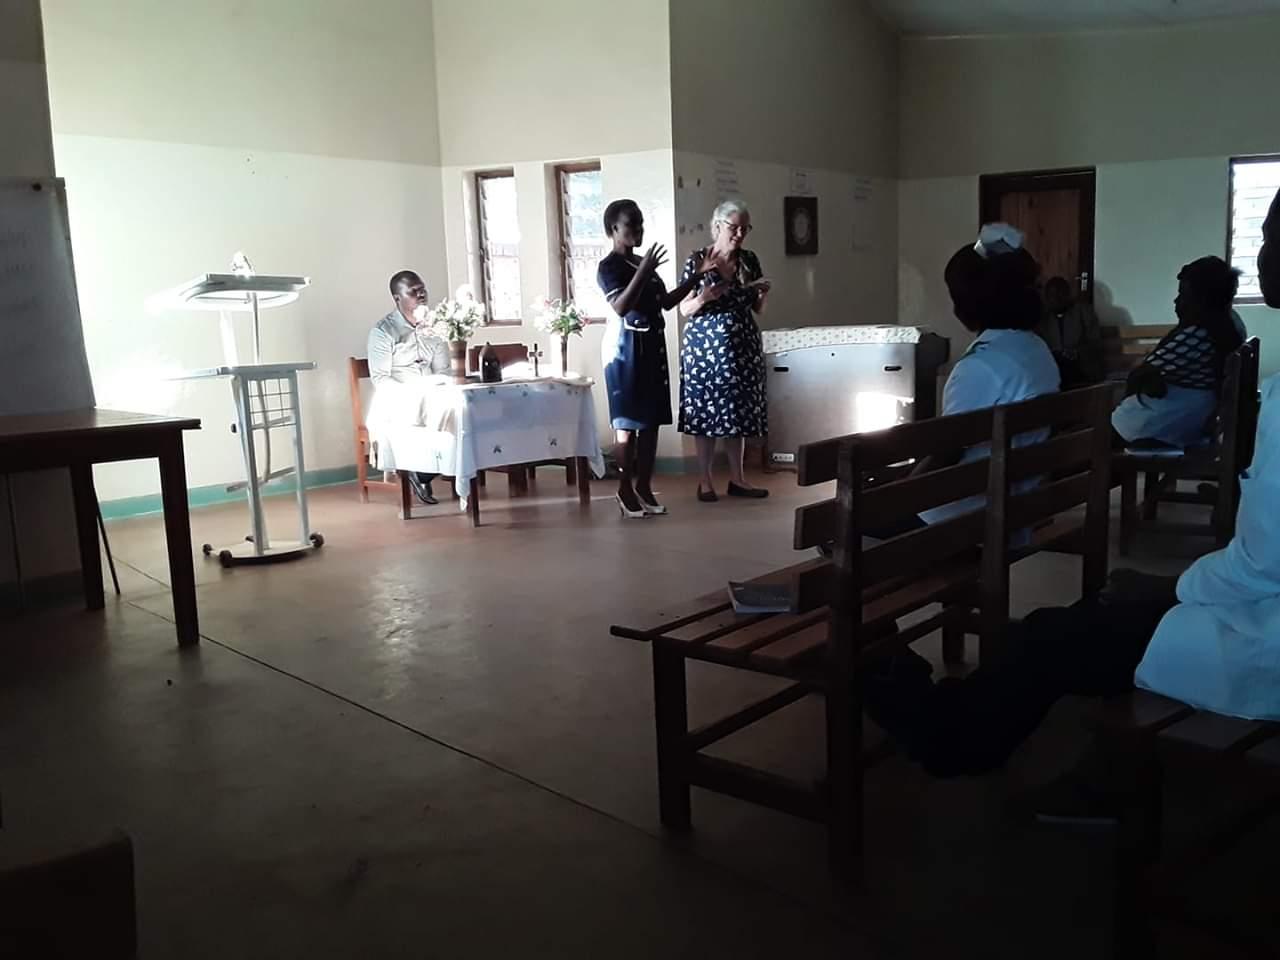 Preaching at Embangweni Hospital Chapel, with George Shaba presiding and Gladys Zimba interpreting. Photo by Wadana Mkandawire